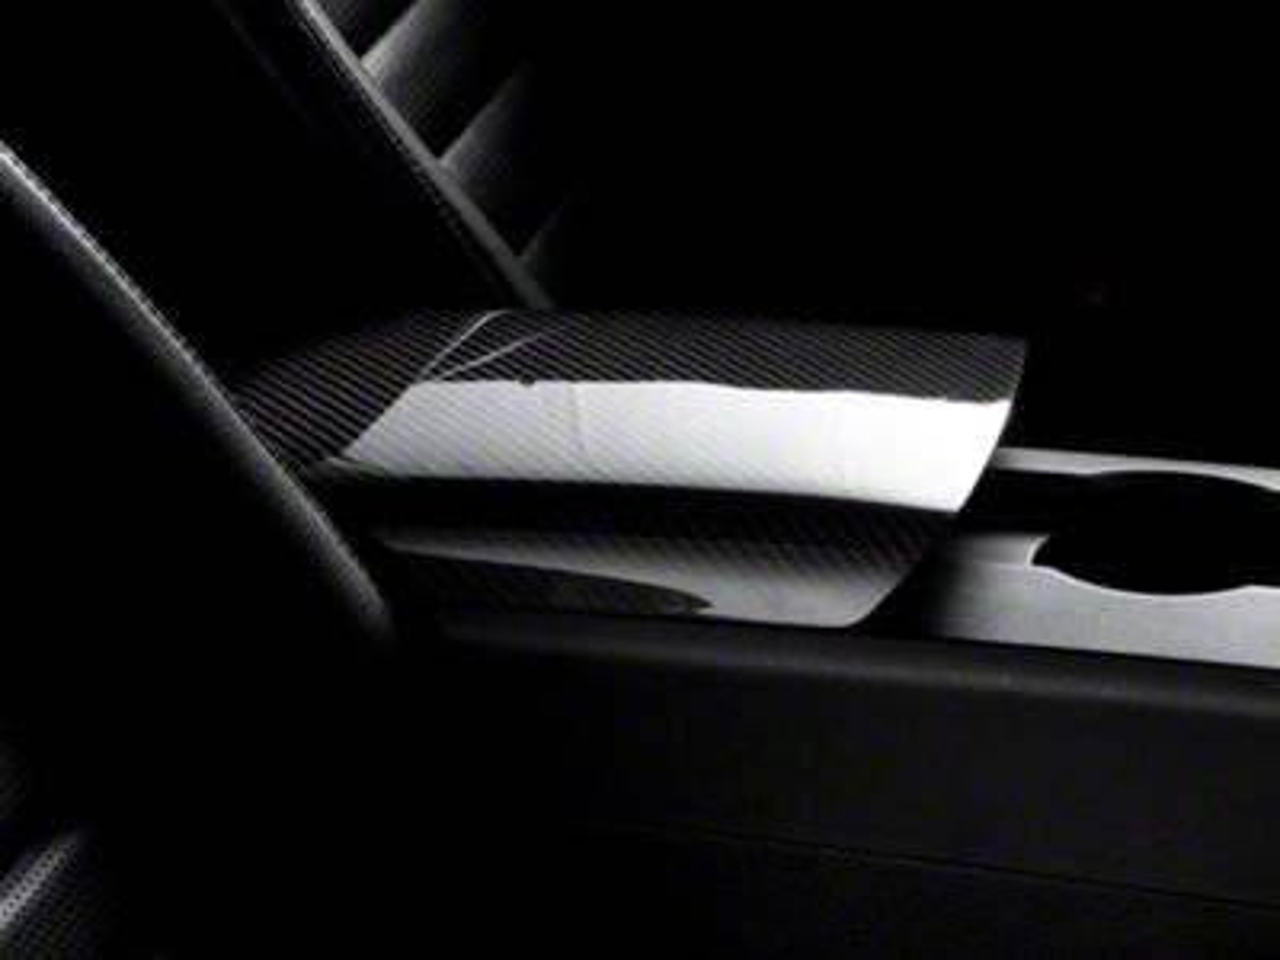 SpeedForm Carbon Fiber Arm Rest Cover (05-09 All)